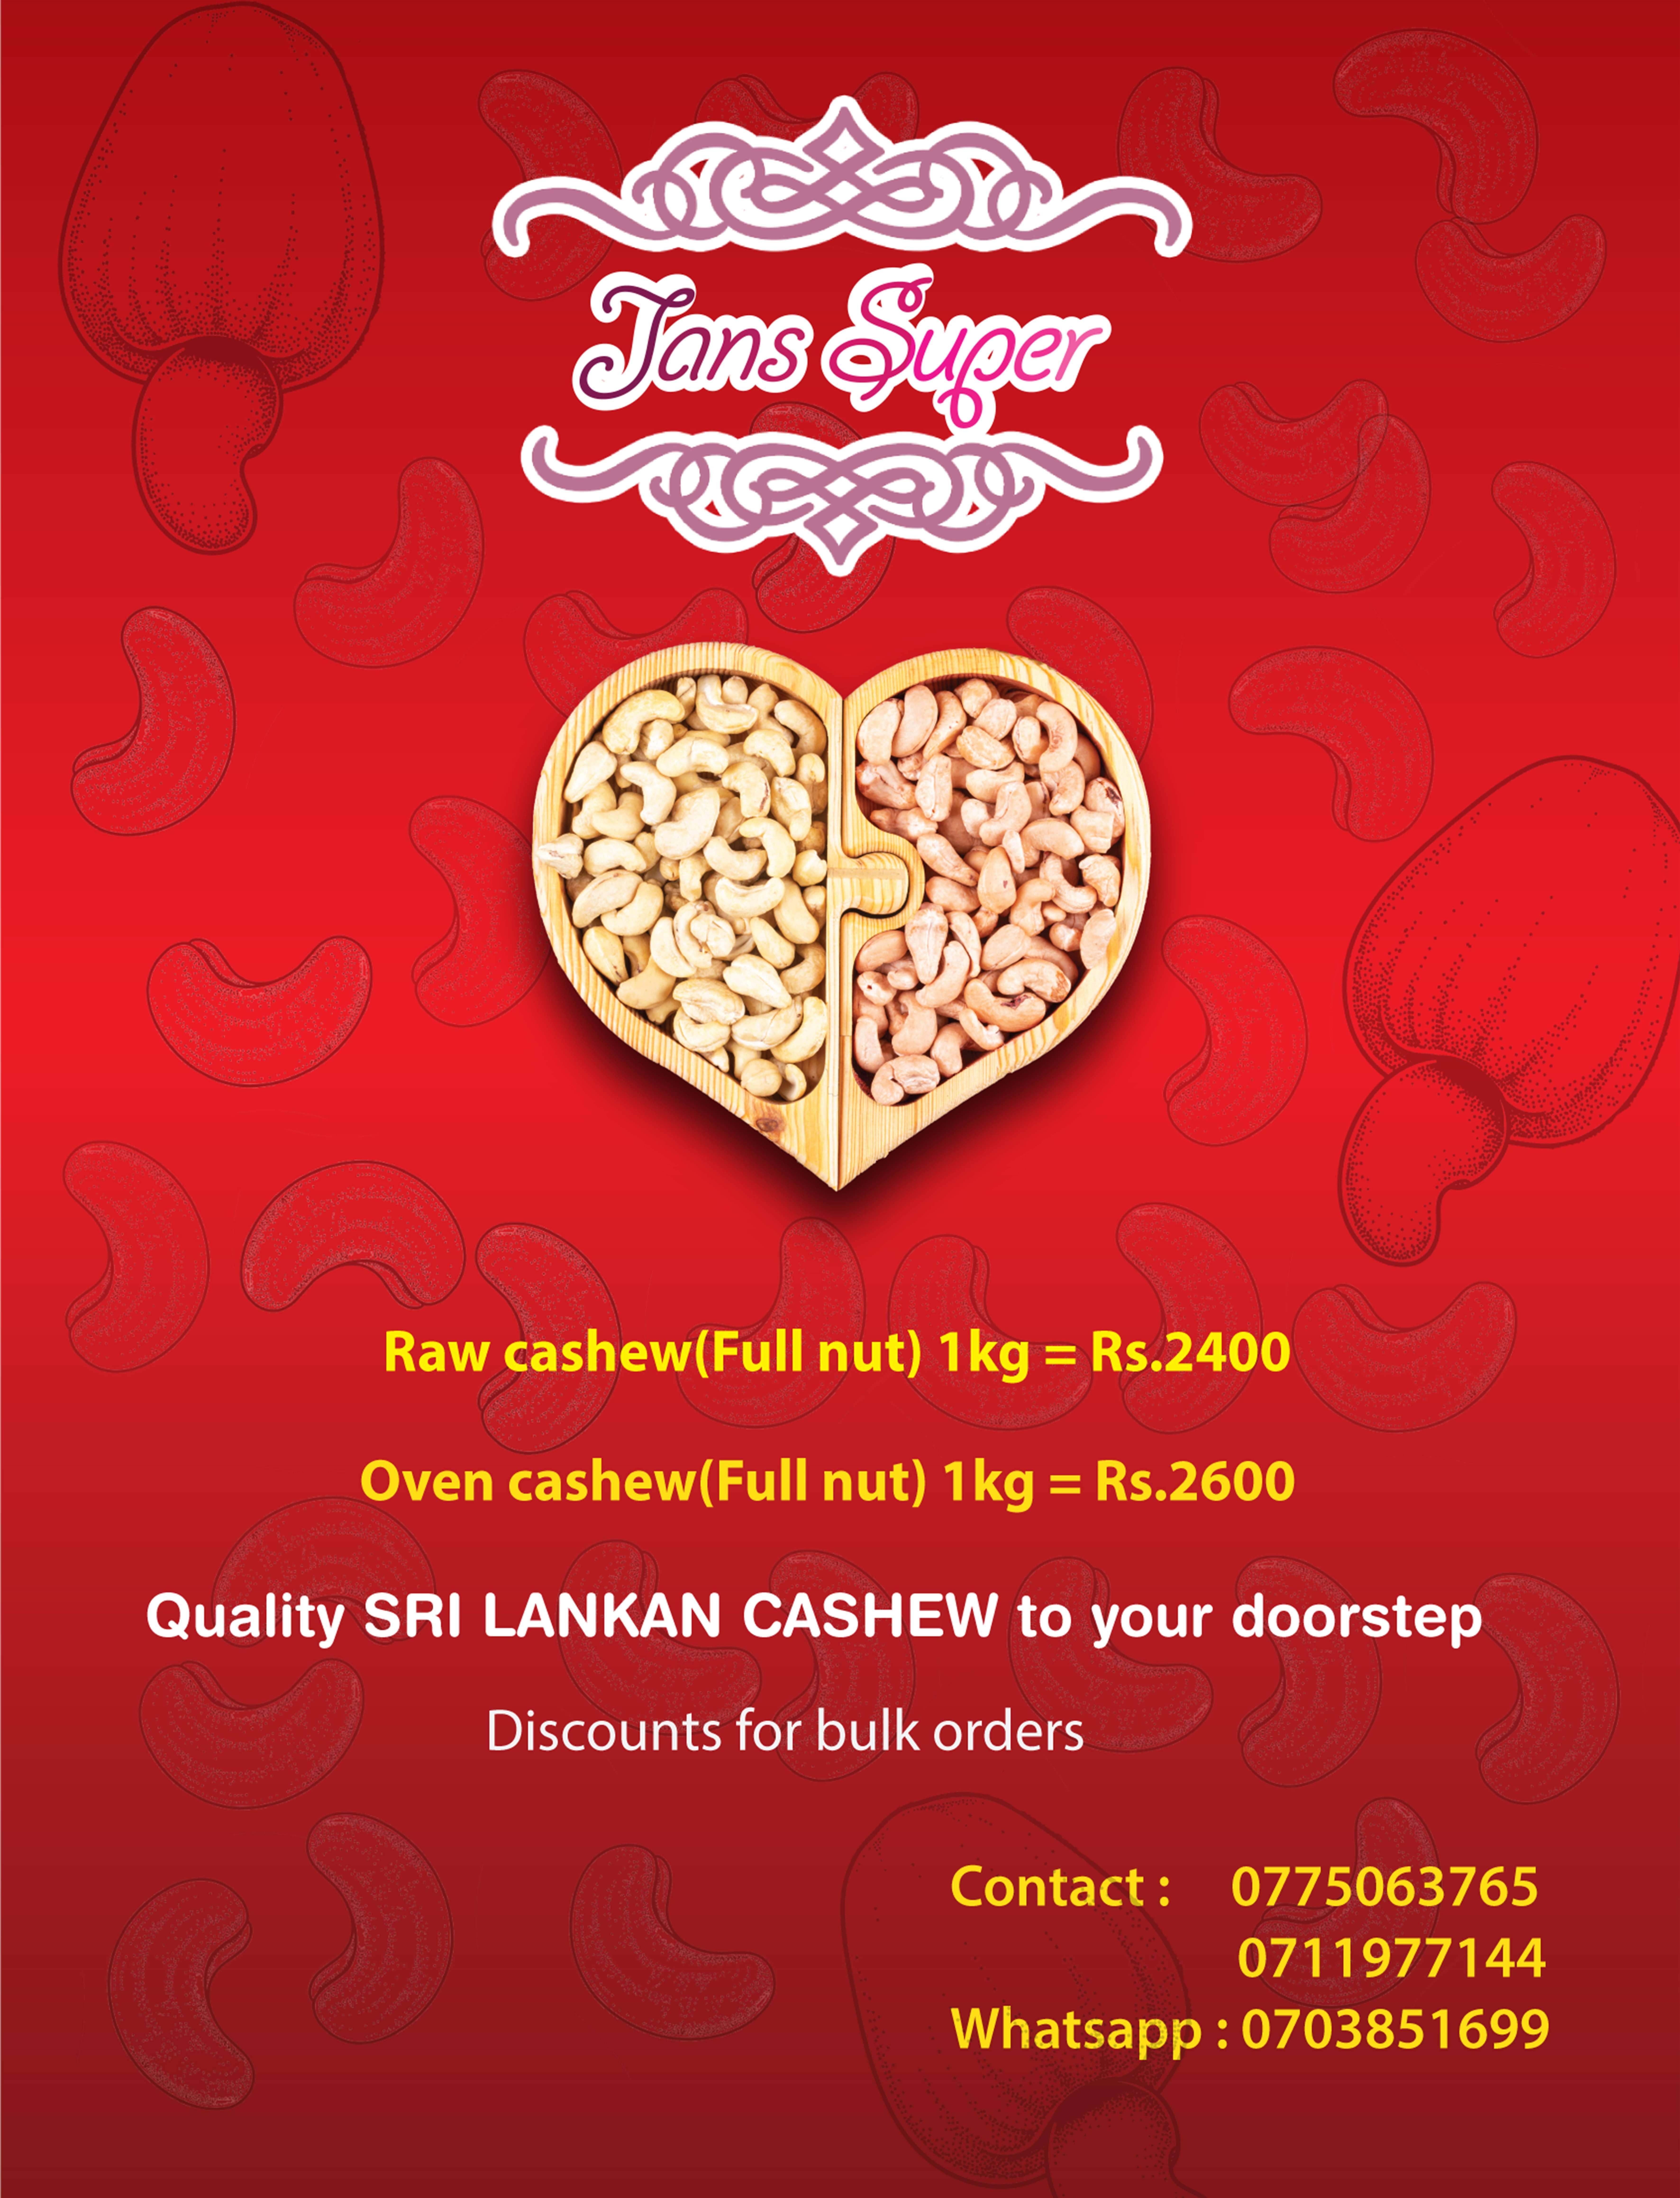 Jans Super Cashew